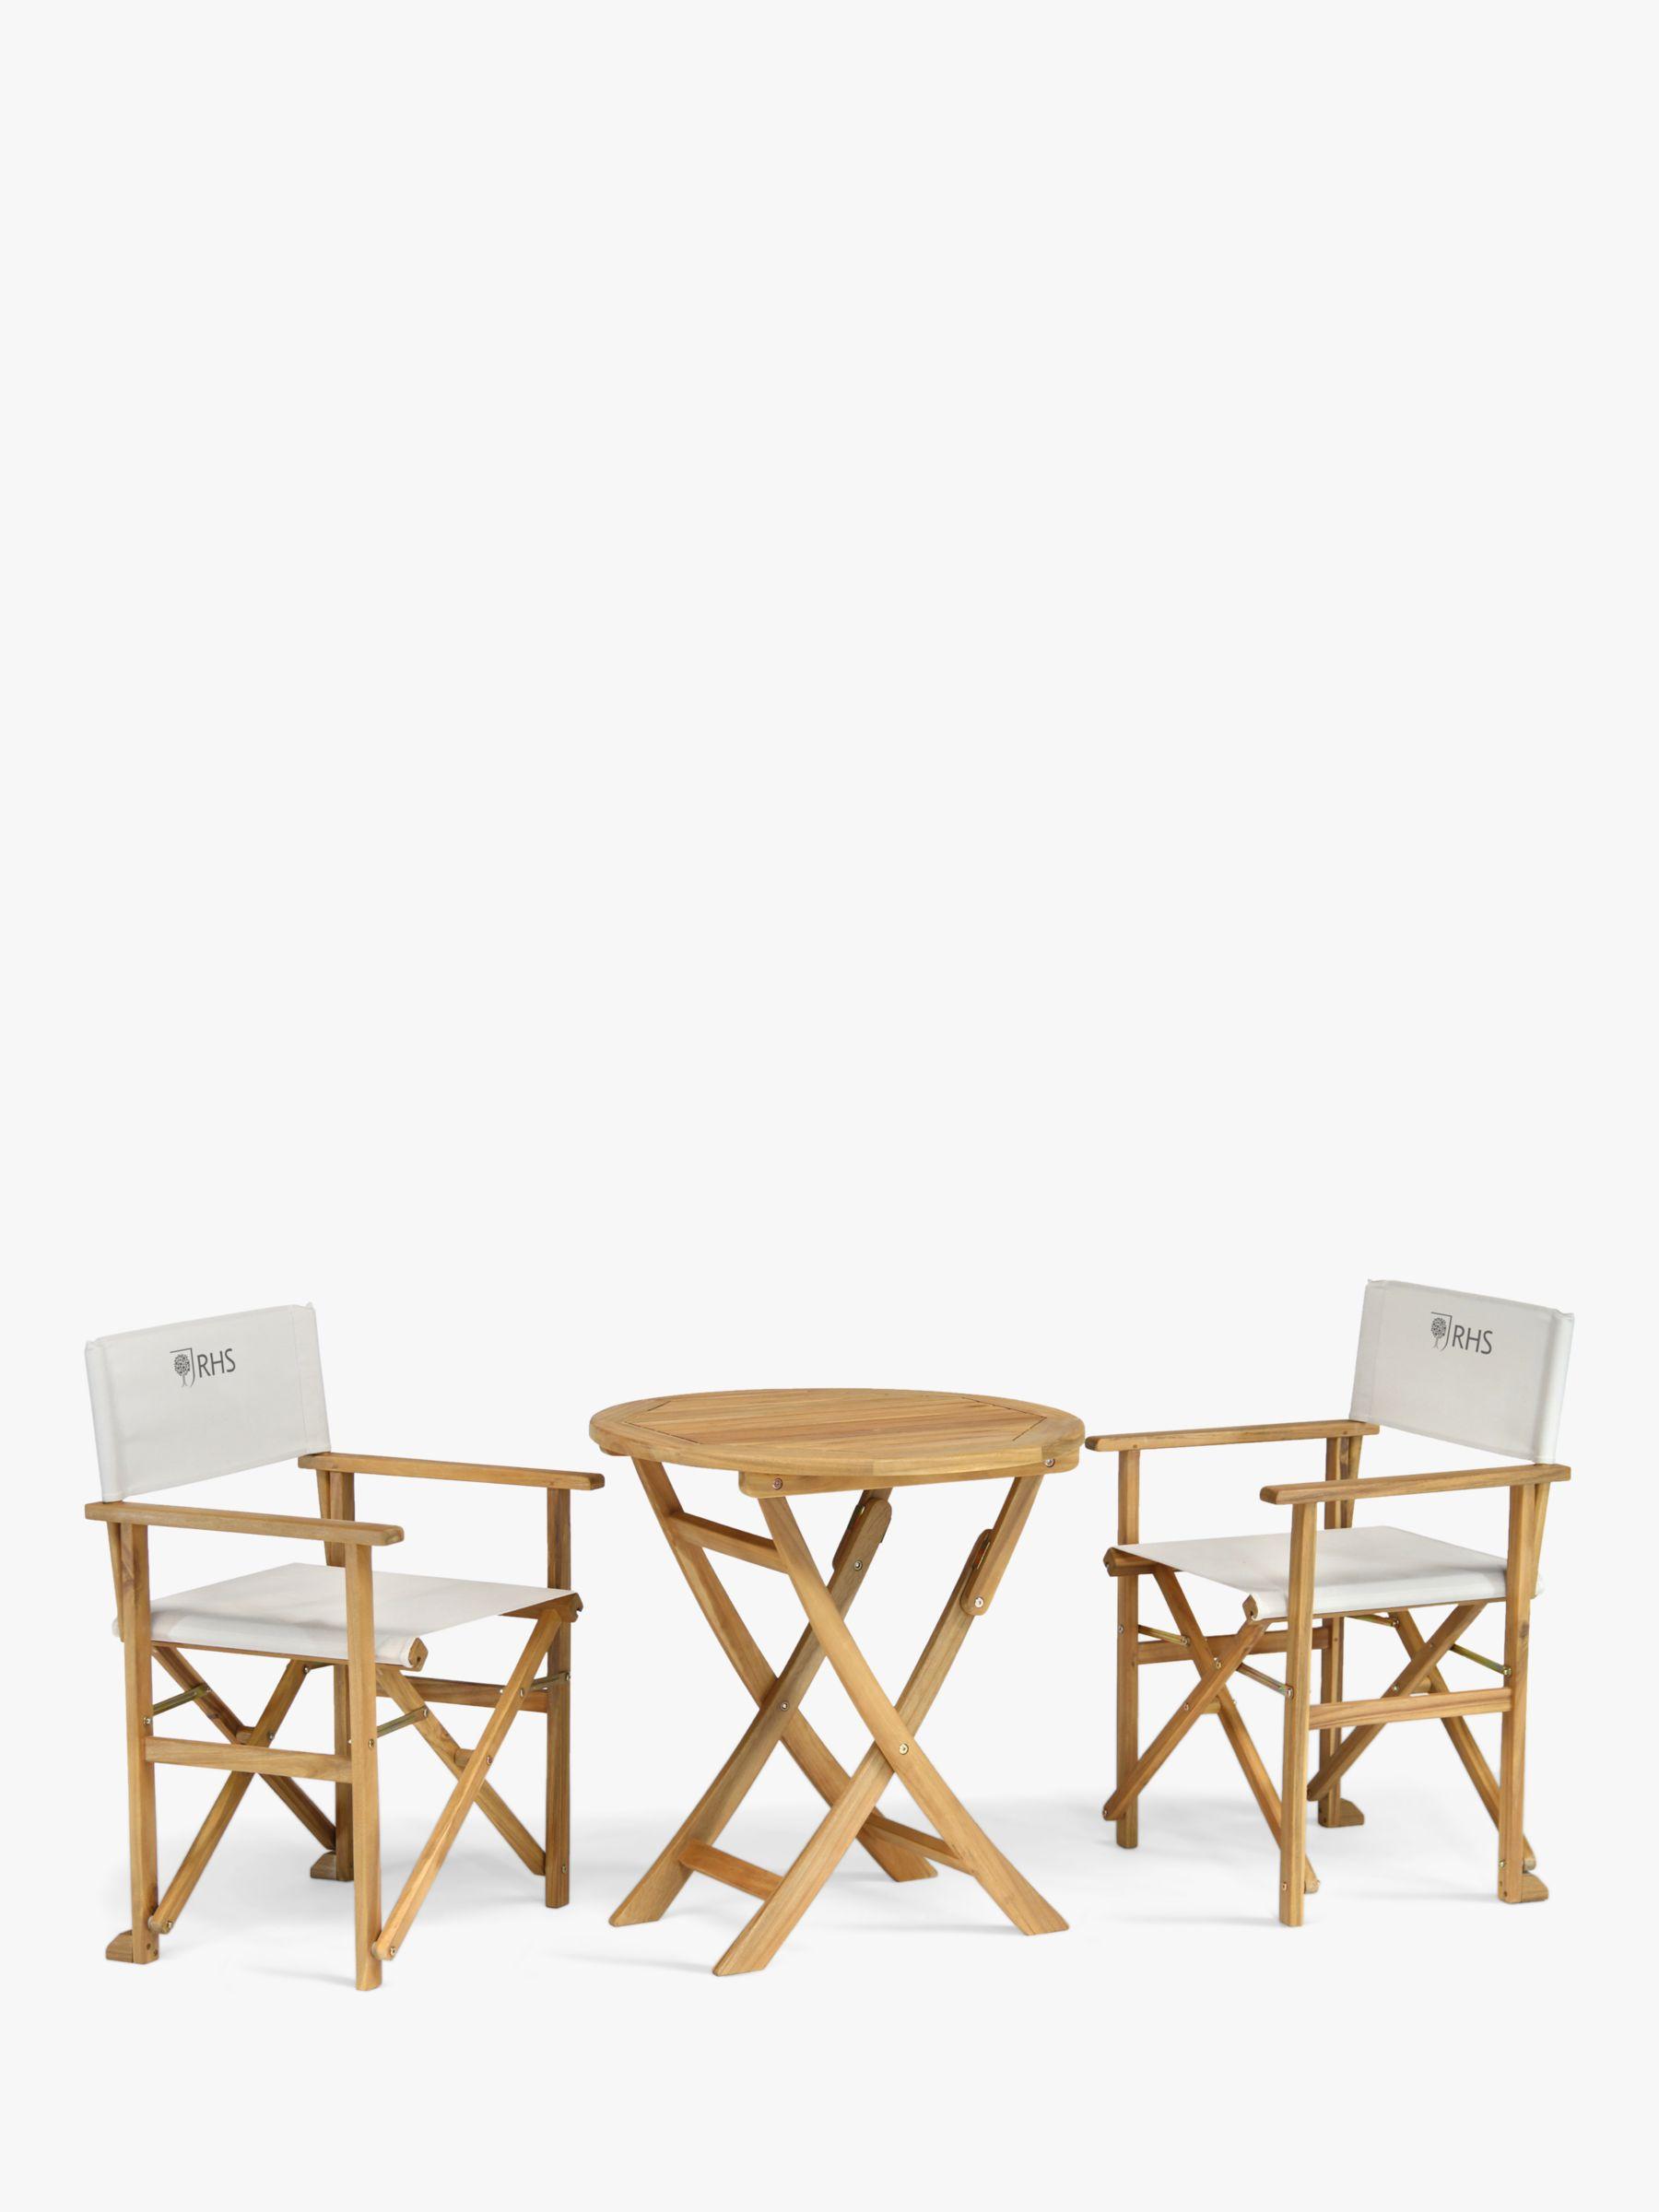 KETTLER RHS Chelsea 2-Seat Garden Bistro Table & Directors Chairs Set, FSC-Certified (Eucalyptus Wood), Natural